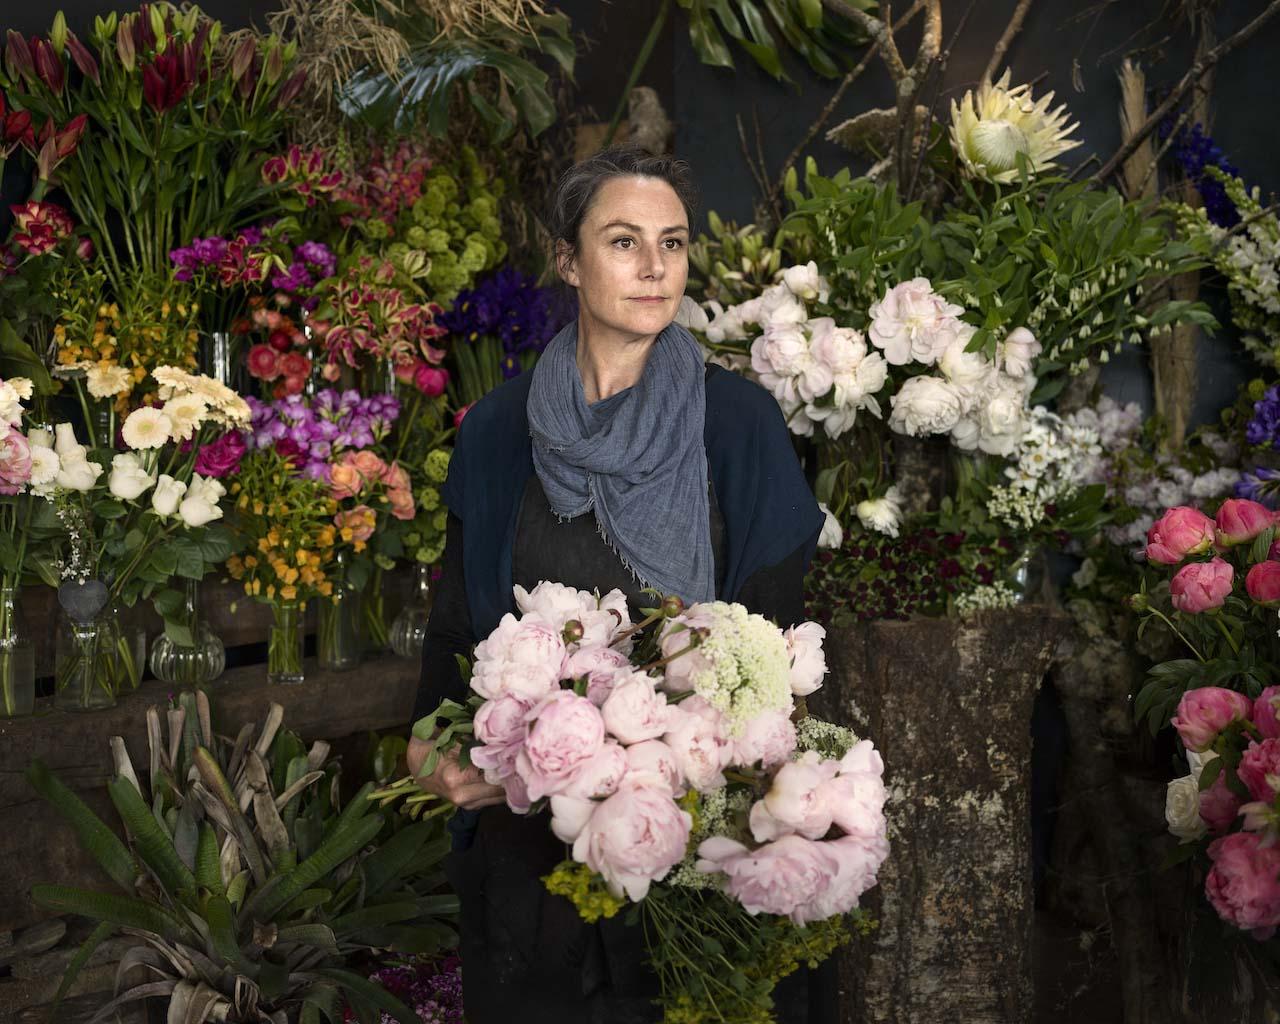 Flowers Manuela